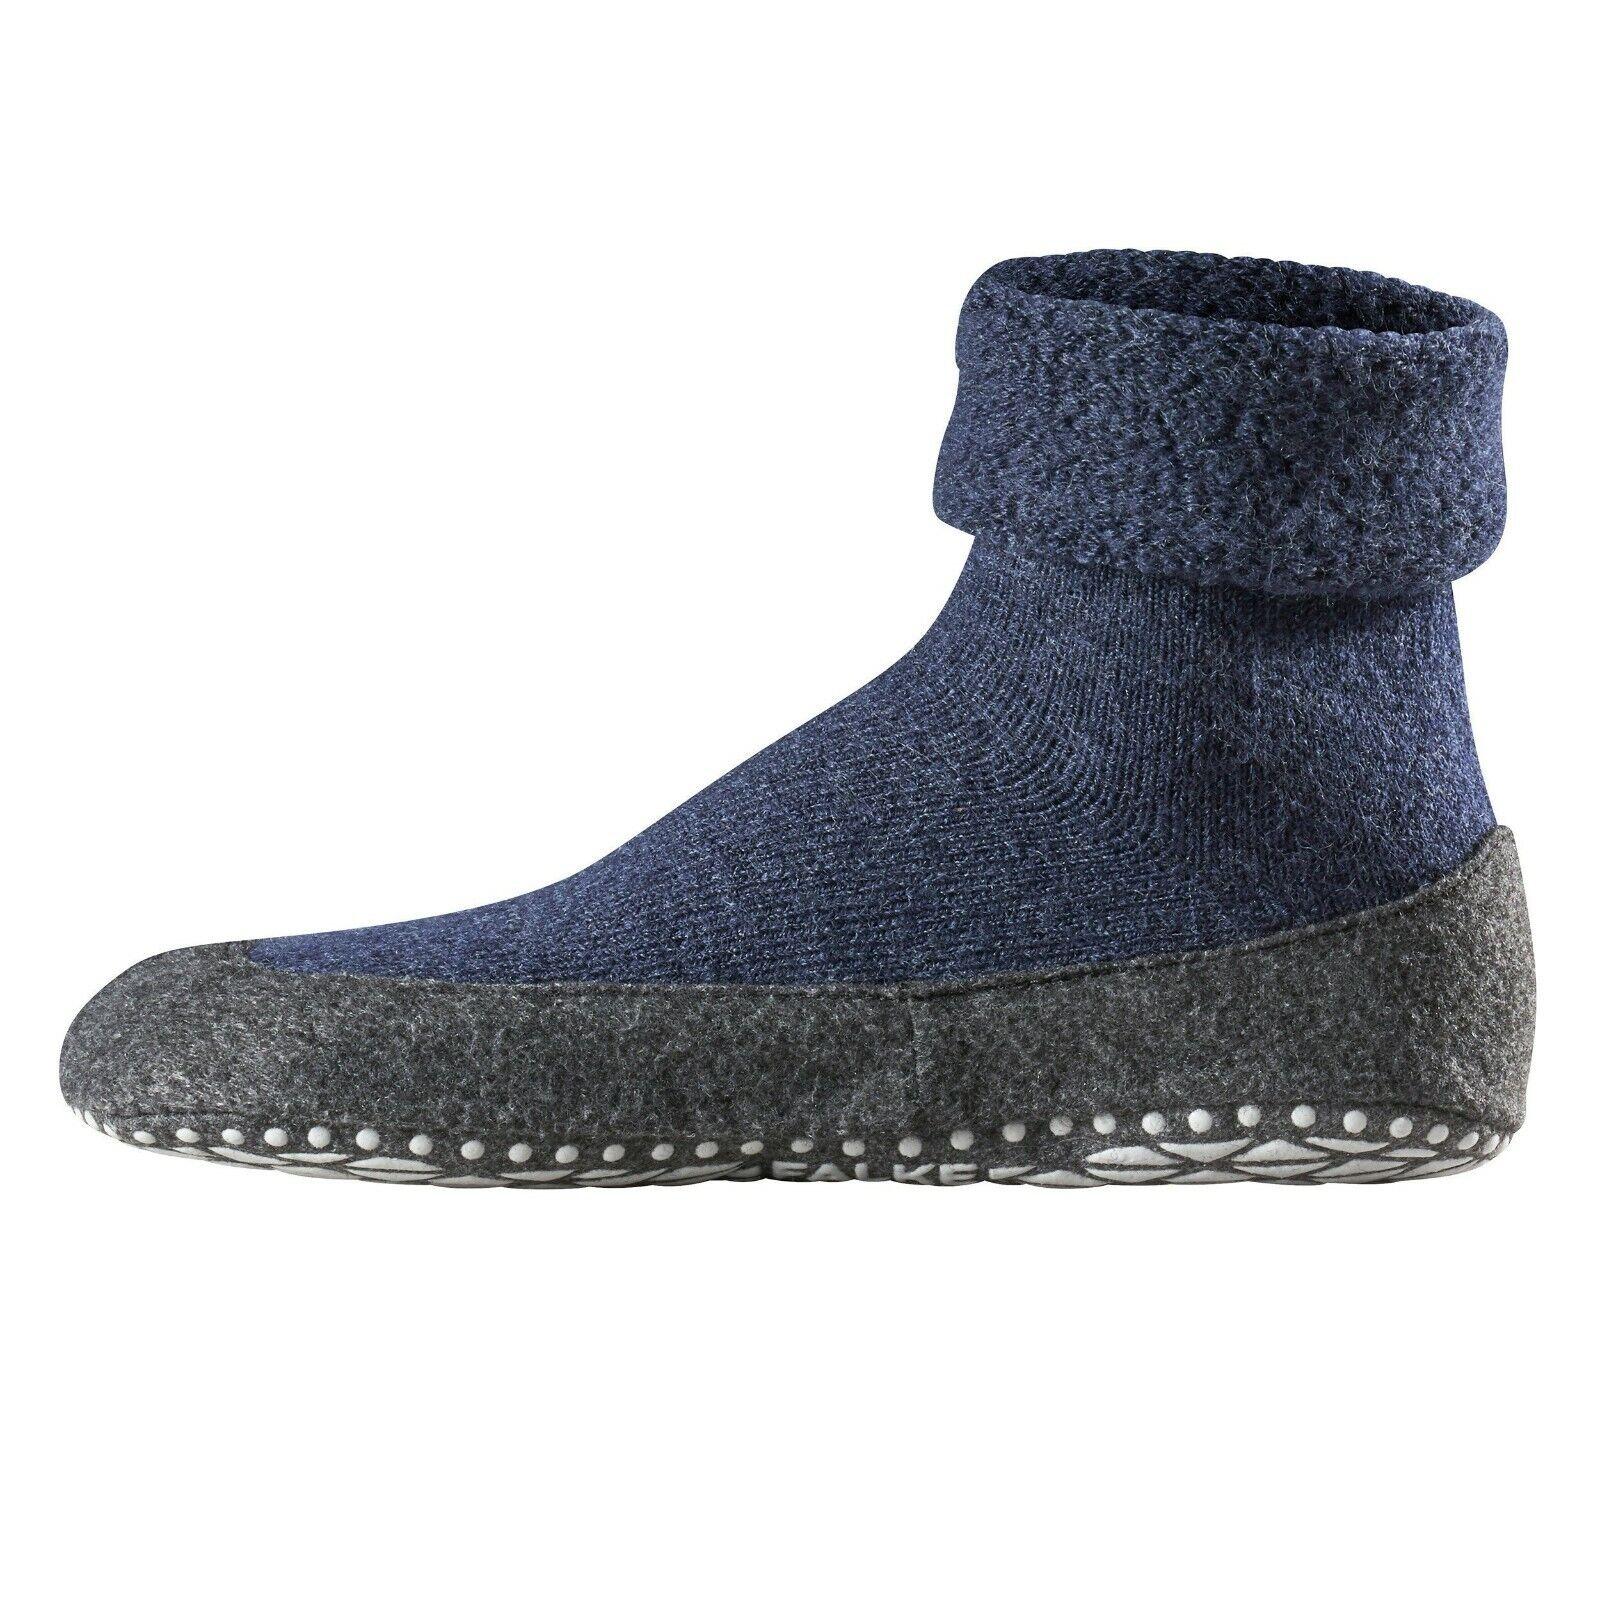 Details about Socks from Home Man Blue Non Slip in Wool Merino Falke Art. 16560 Cosyshoe